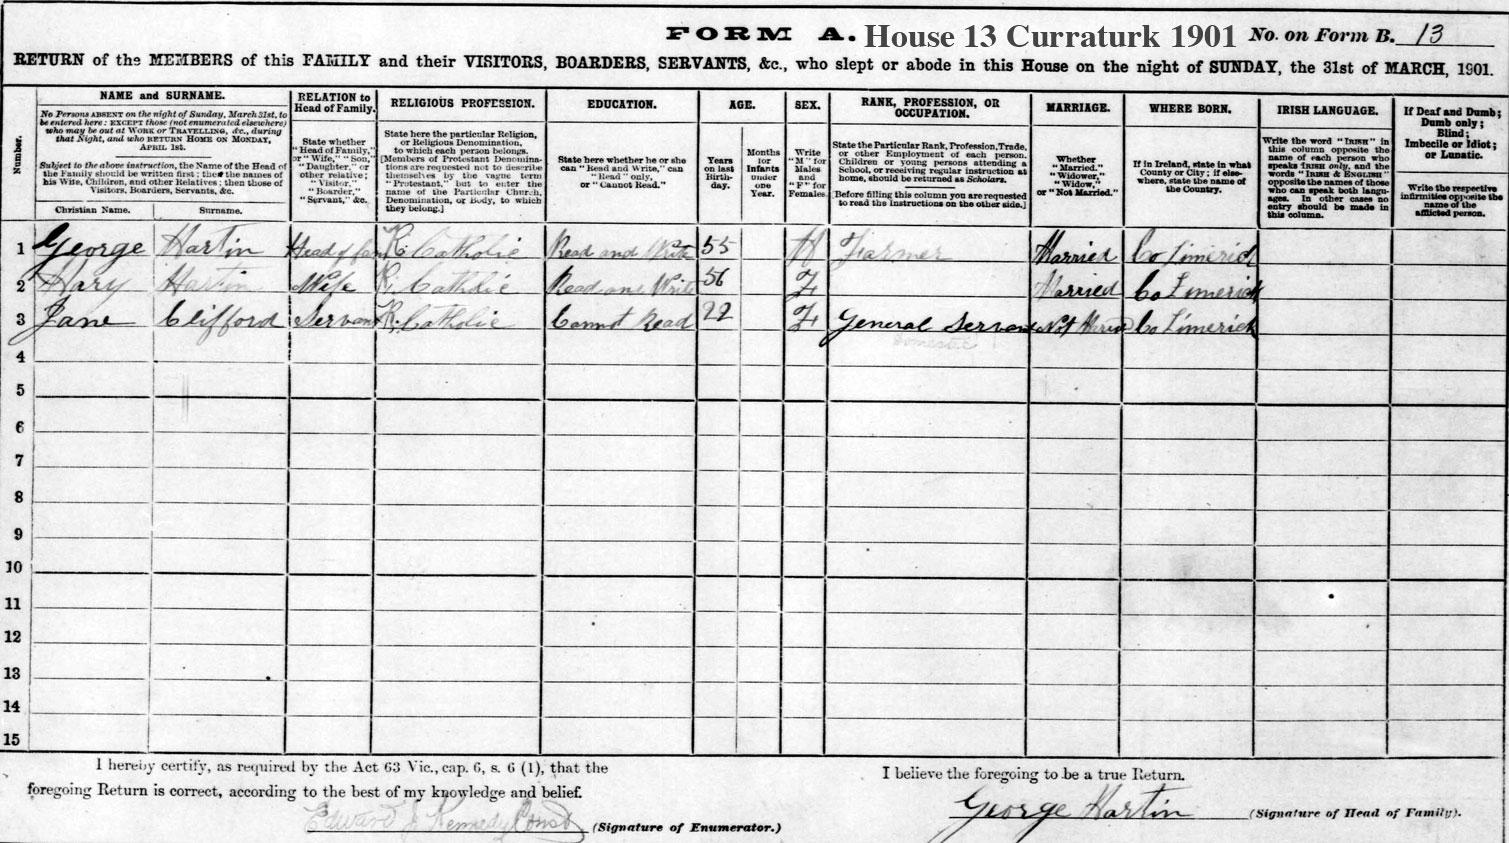 House-13-Curraturk-1901